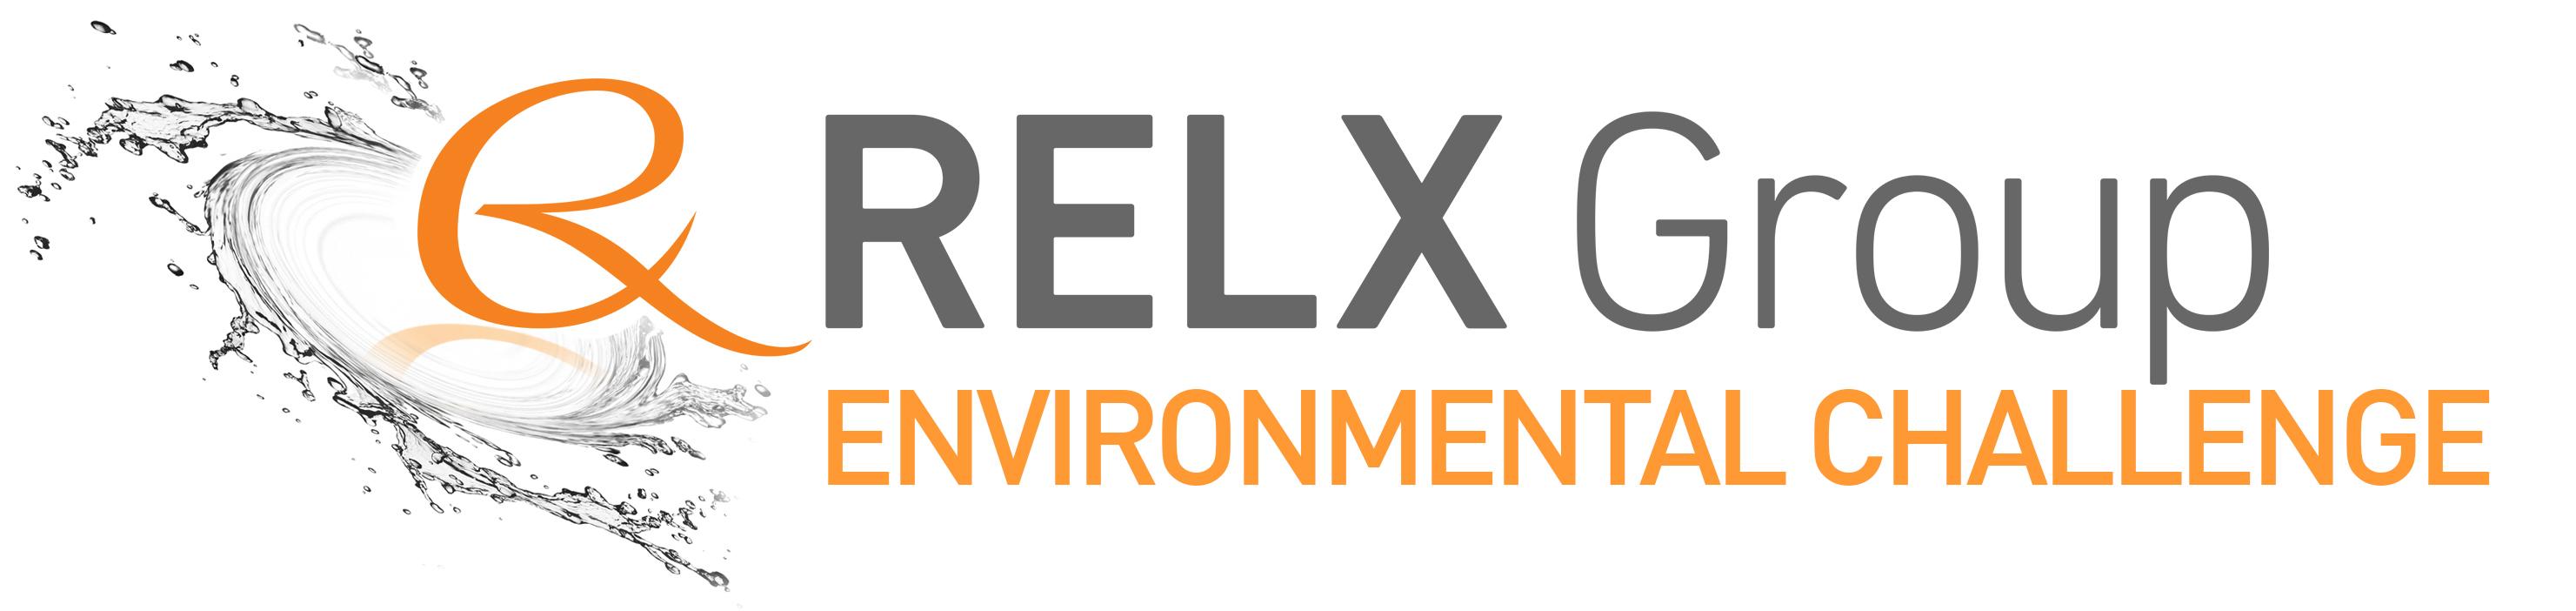 Relx Group Environmental Challenge logo